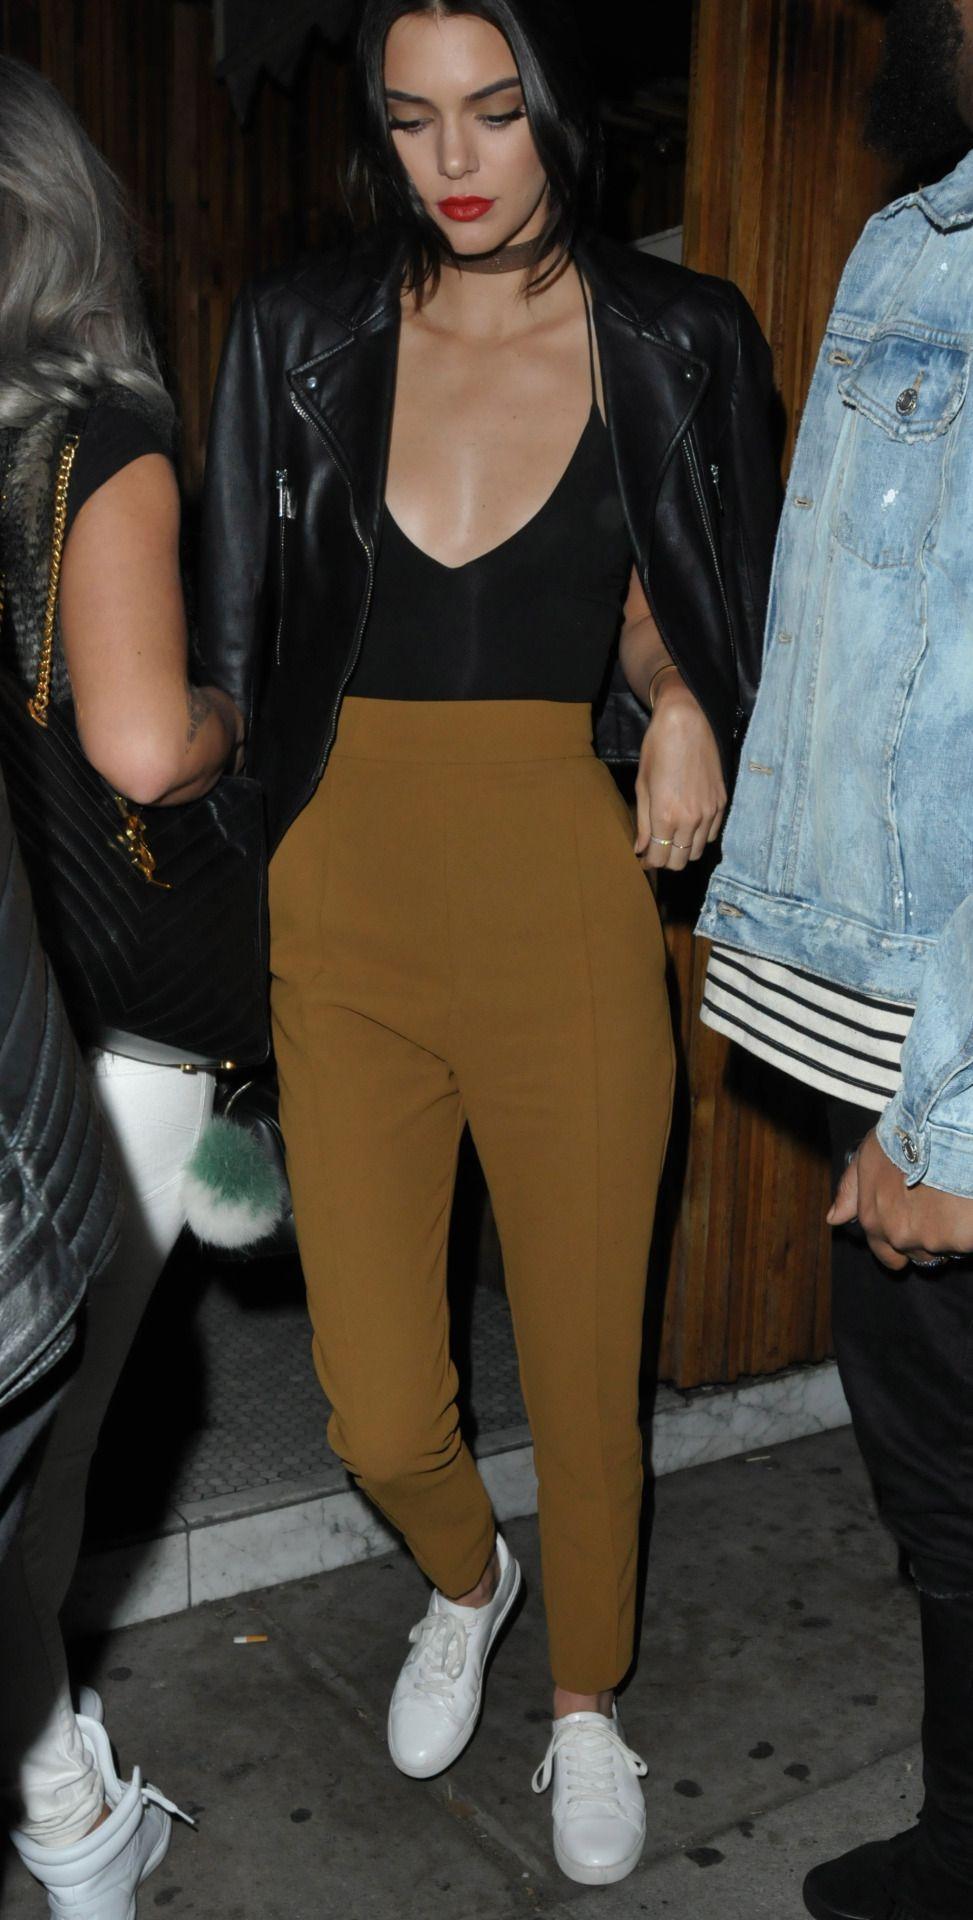 e9366364a219dc Kendall Jenner Trades Crop Tops for Maxi Coats in Paris | Kendall ...